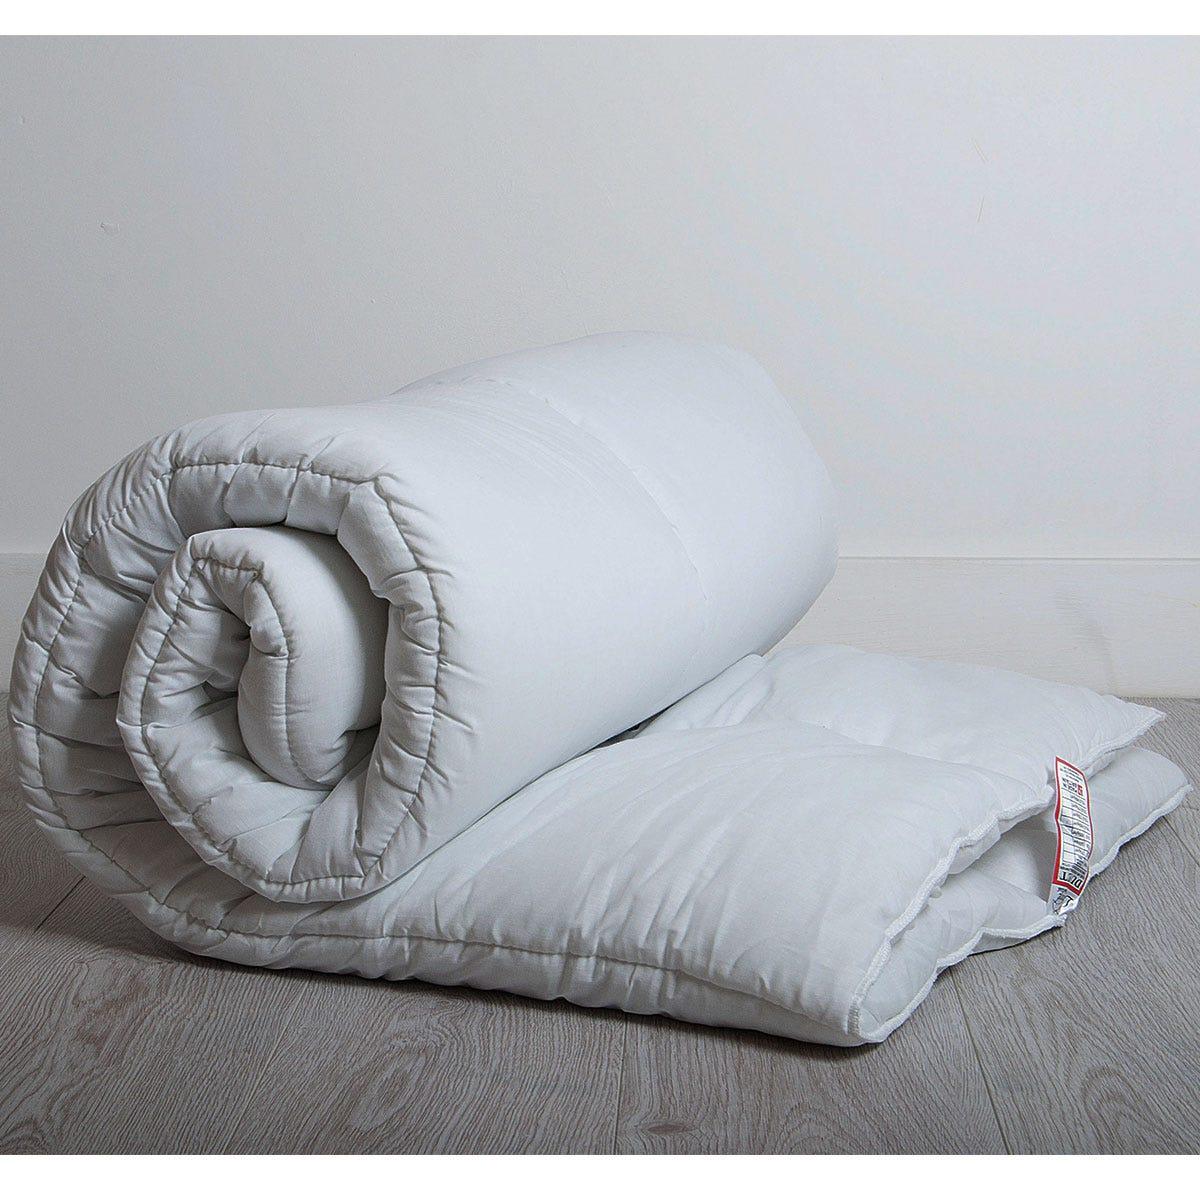 Lancashire Textiles 13.5 Tog Egyptian Cotton Duvet - Super King